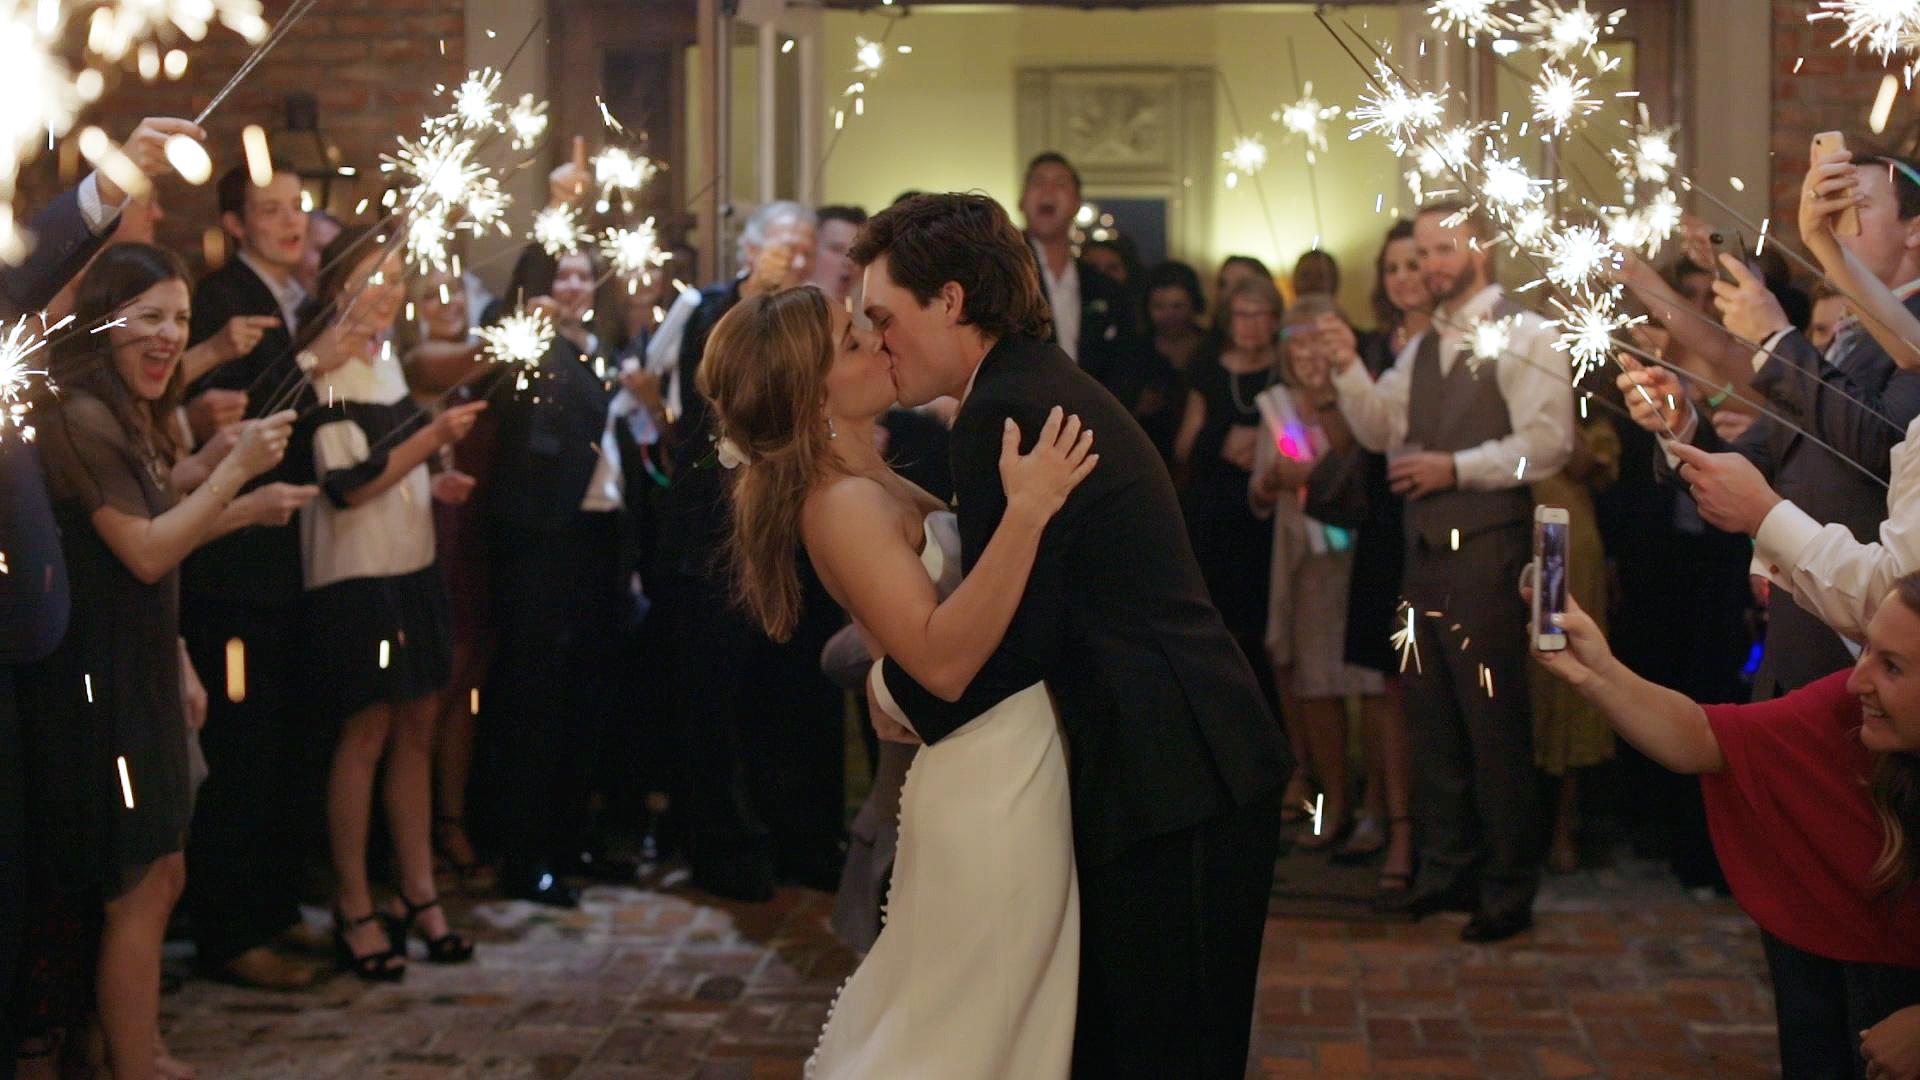 Covington Country Club Wedding Video - Bride Film - Sparkler Exit